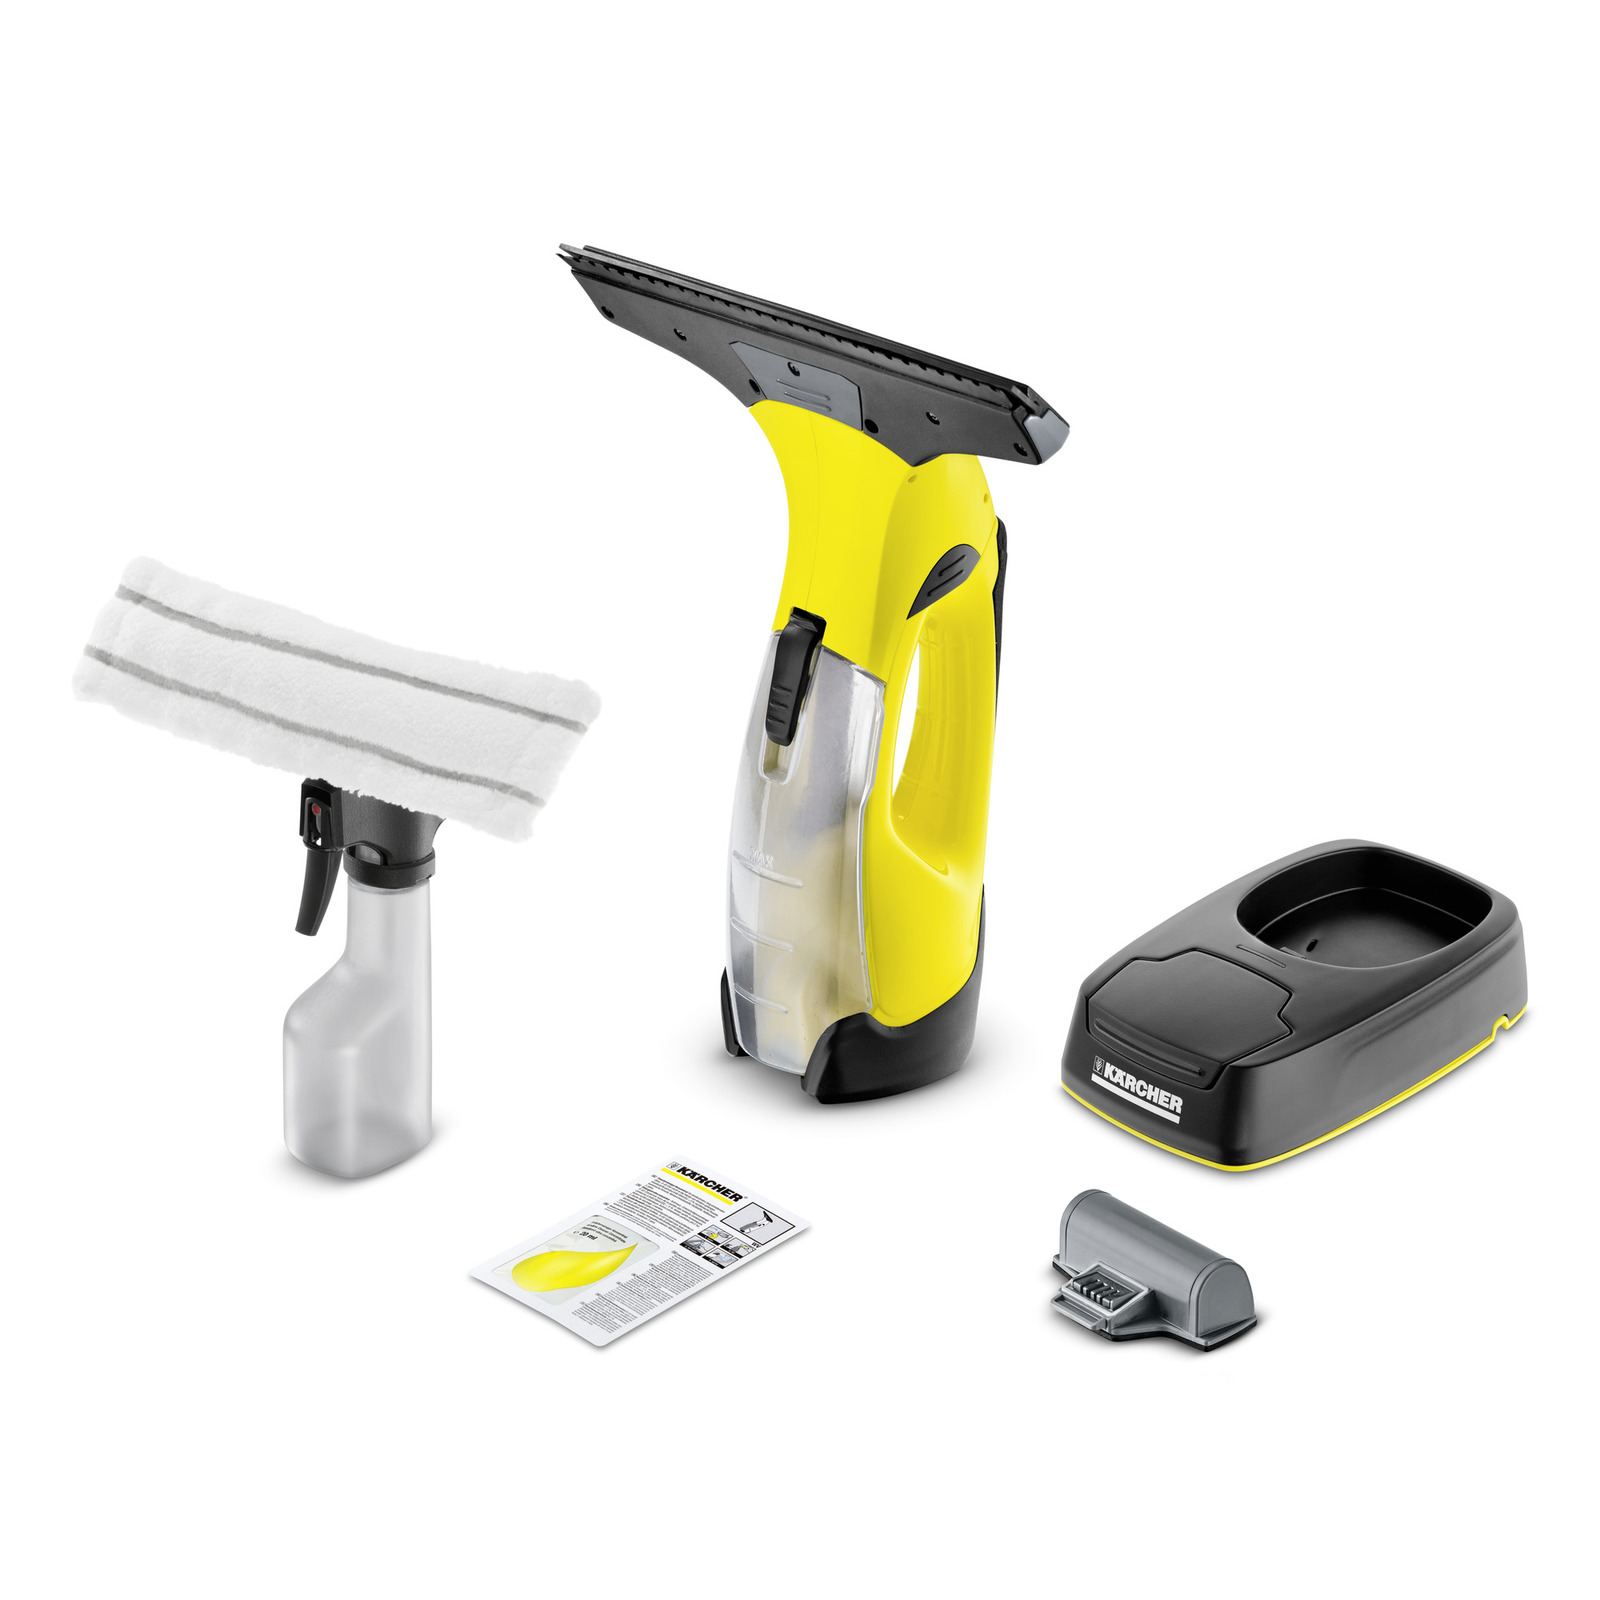 Akku-Fenstersauger WV 5 Plus Non Stop Cleaning Kit *EU | Kärcher